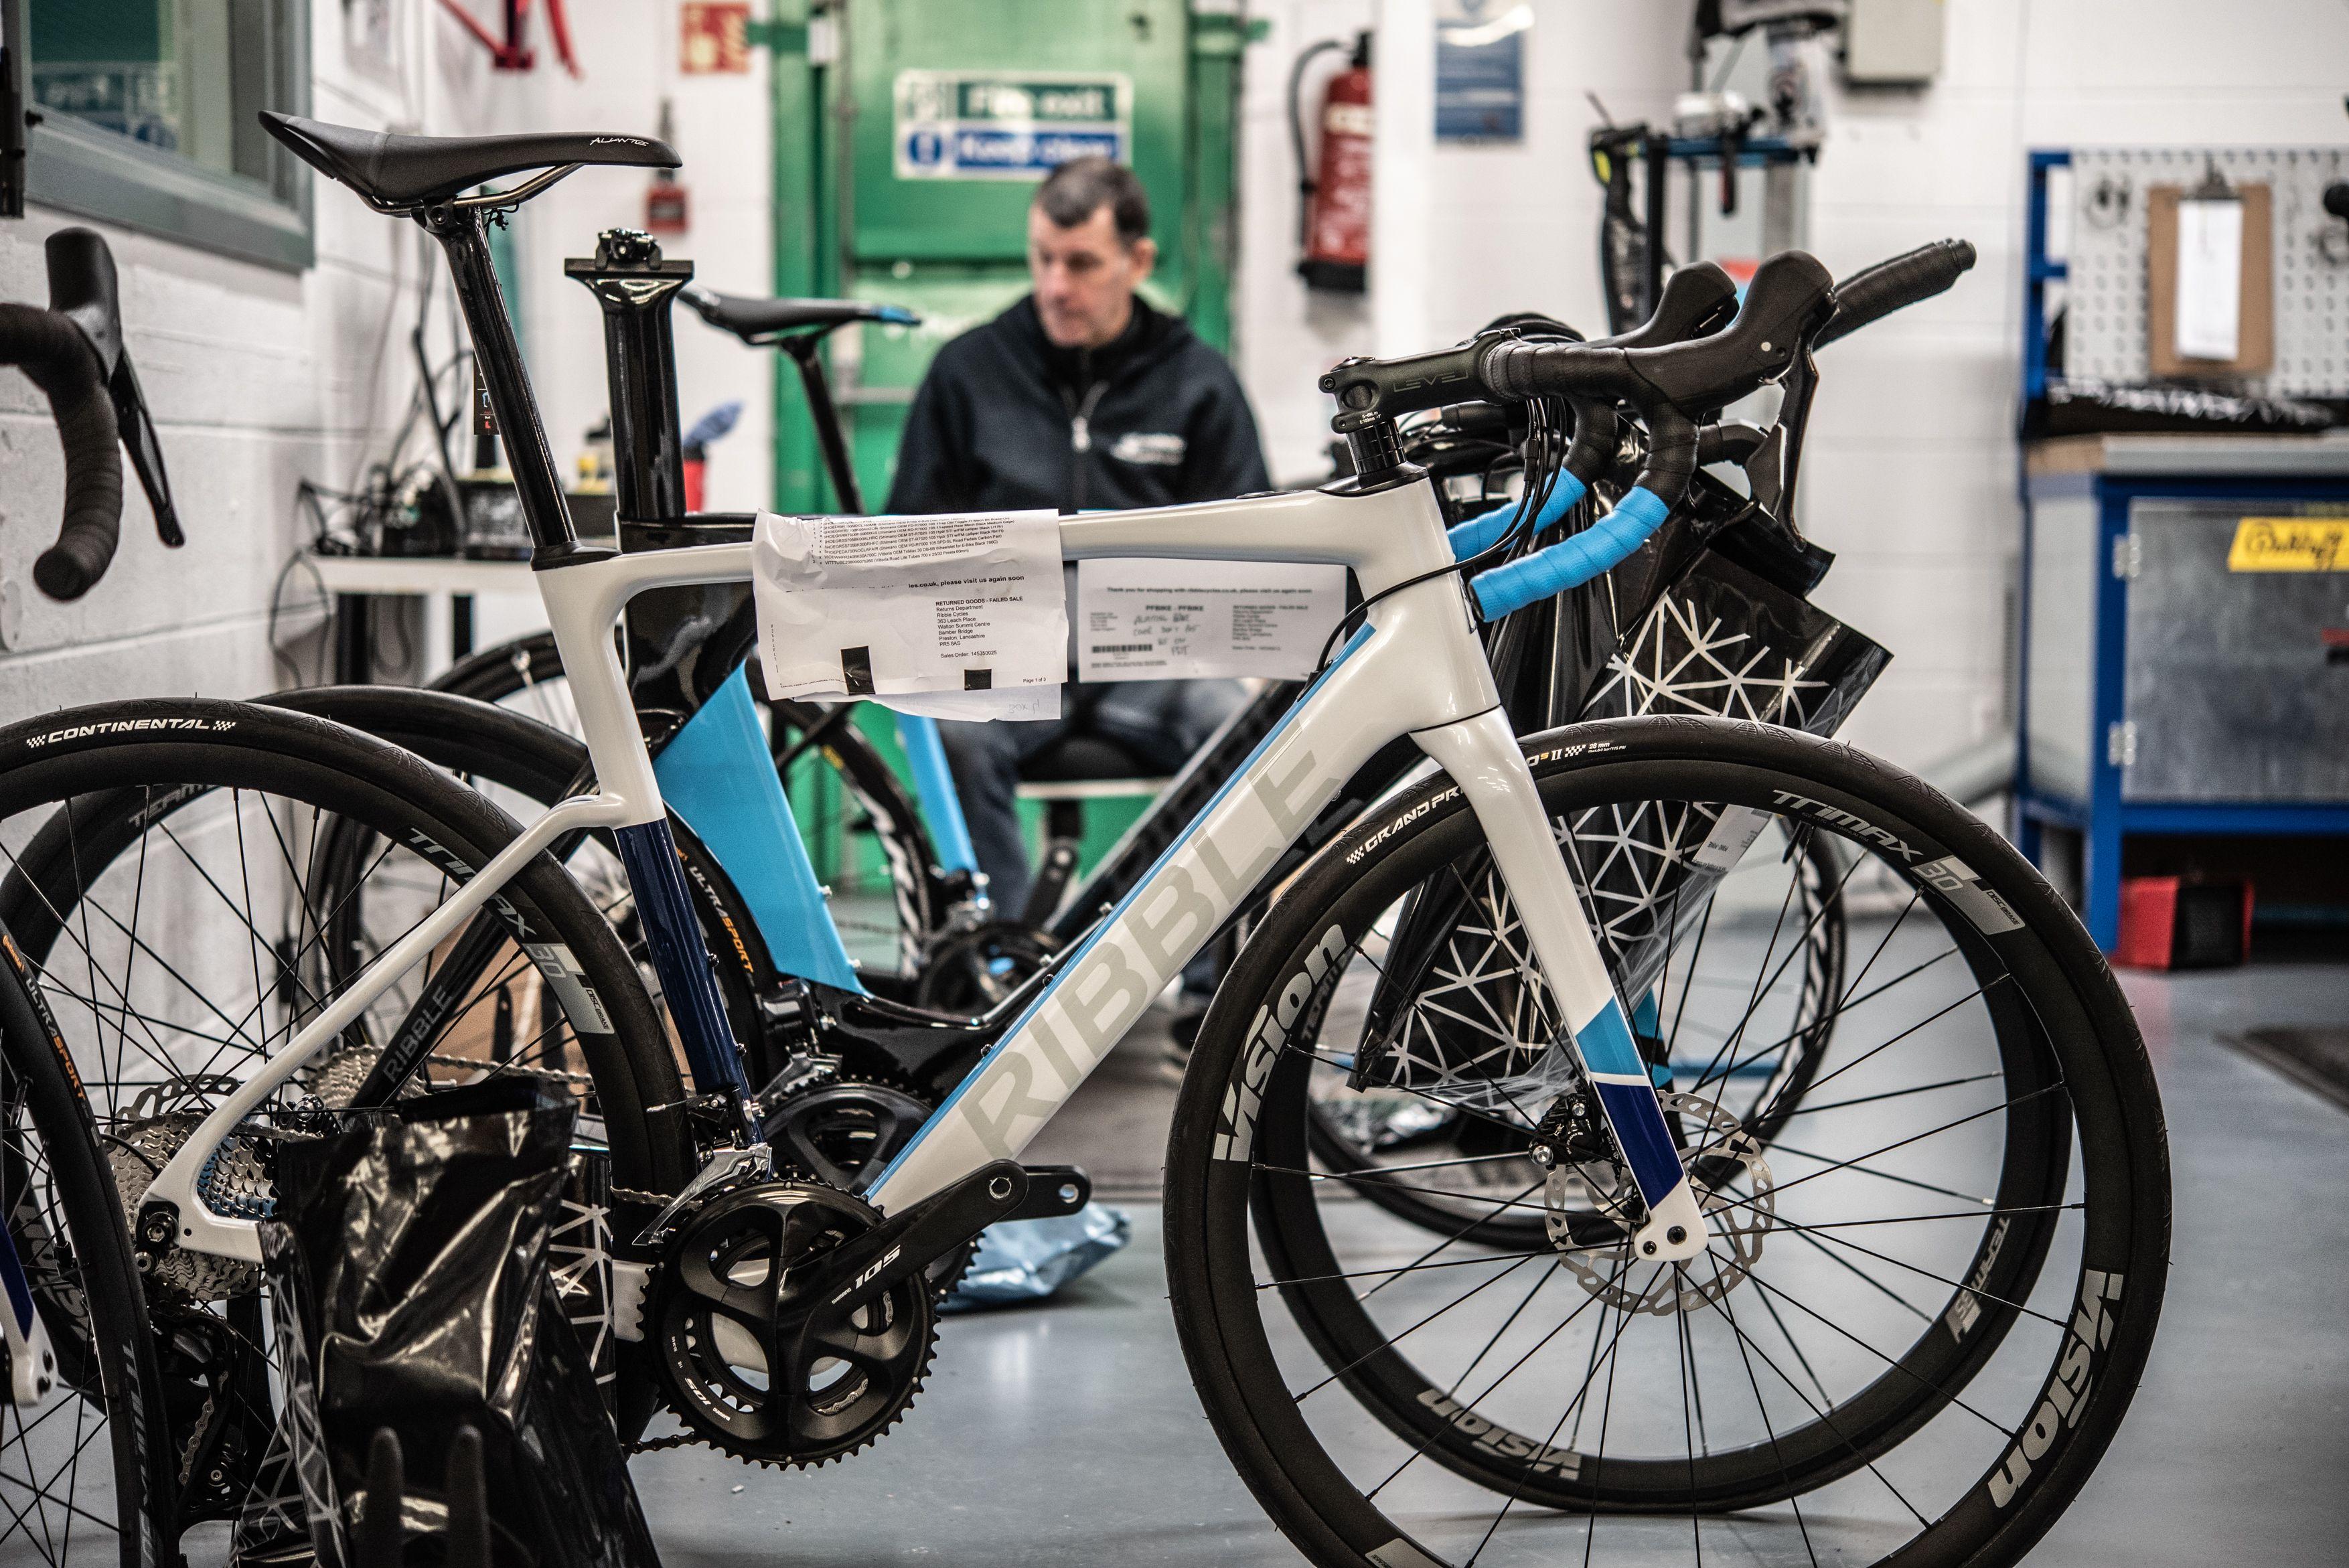 Pin By Ribble Cycles On About Us Bike Shop Online Bike Shop Bike